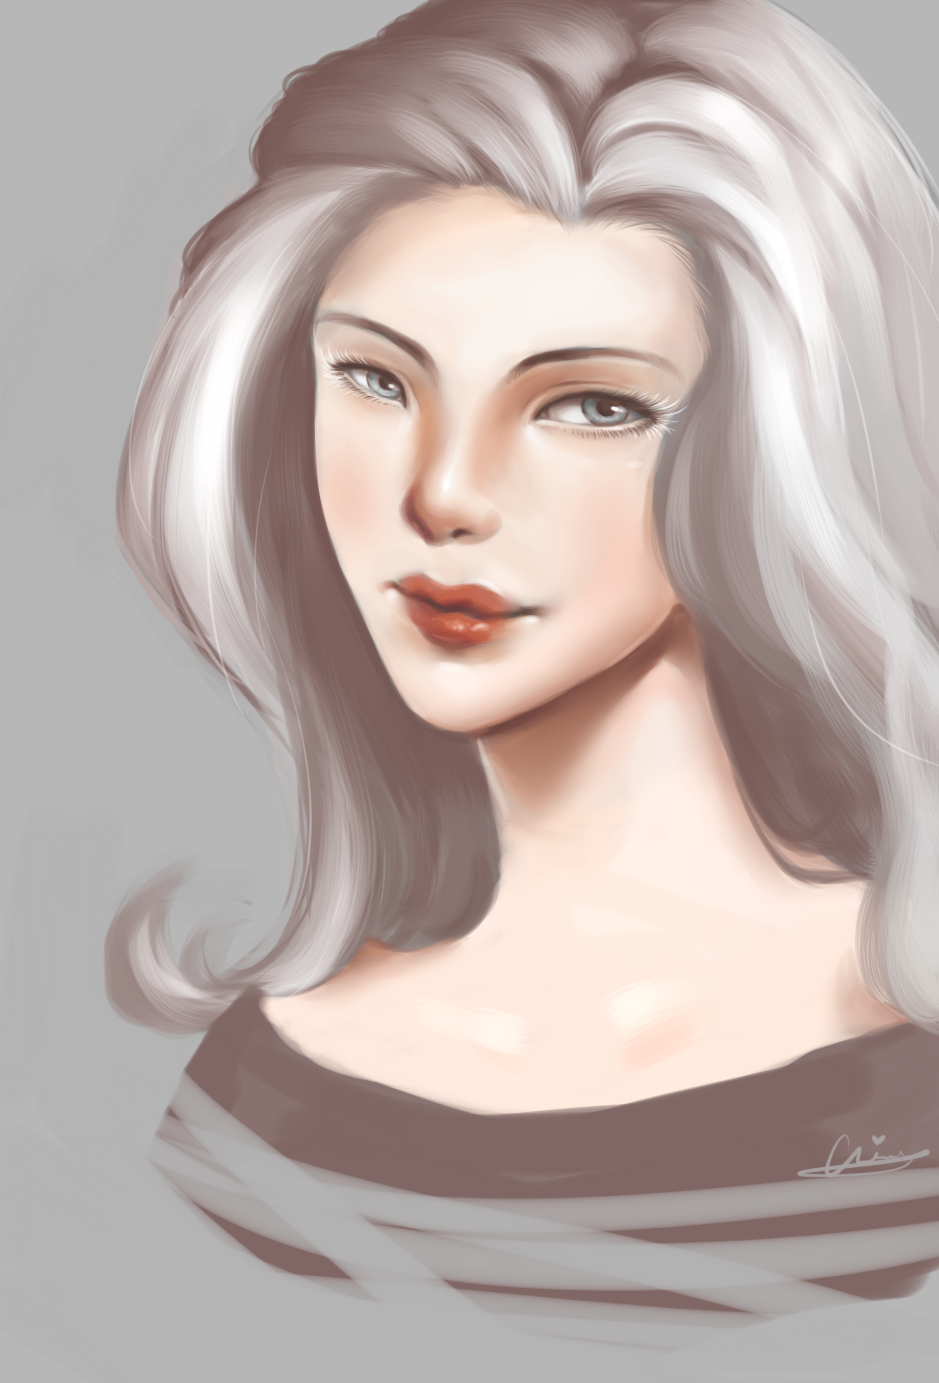 Lady Snow by wangqr